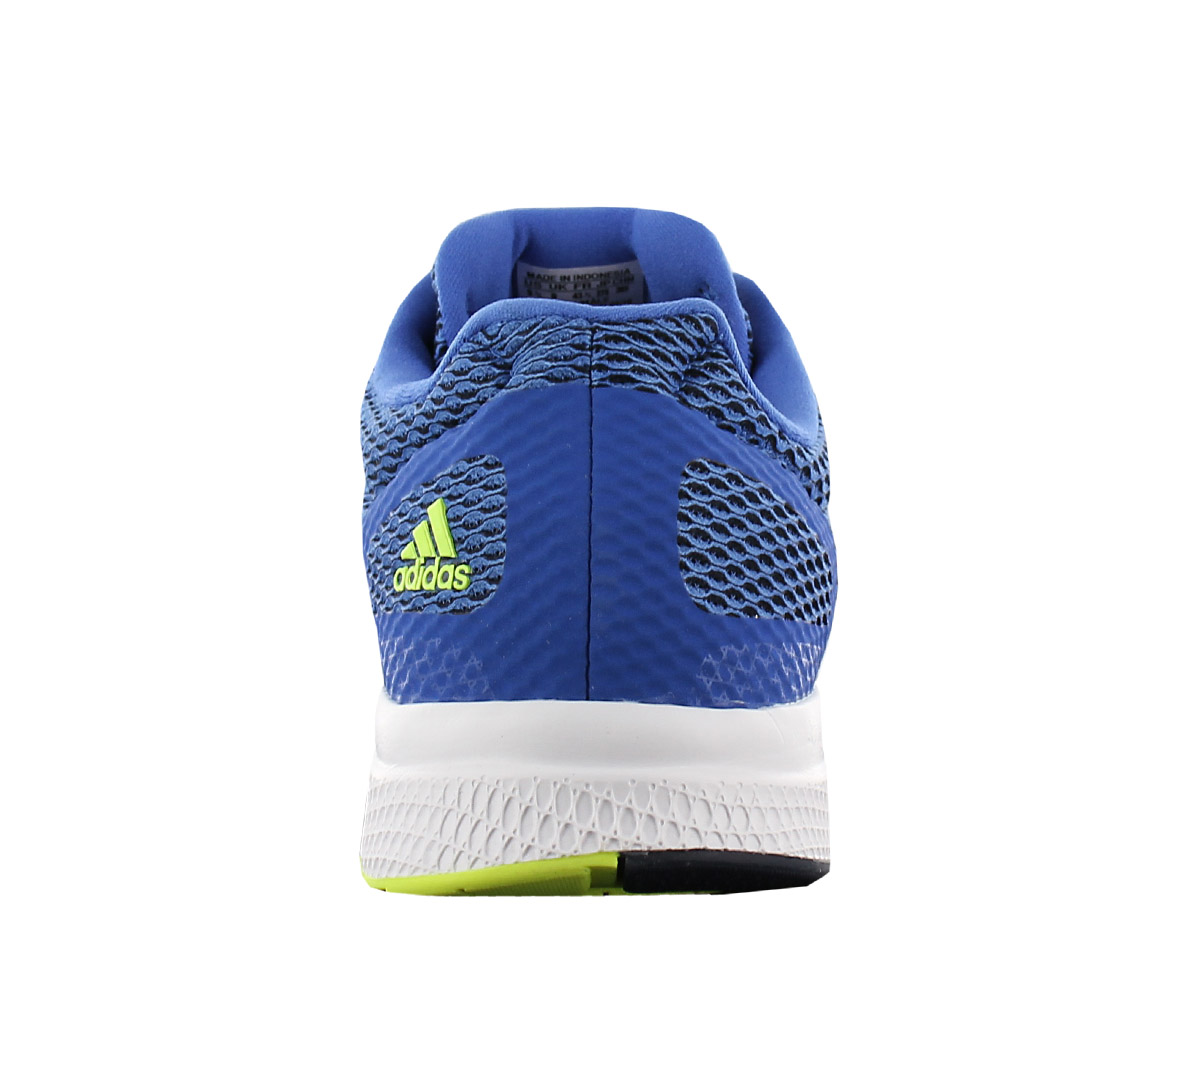 21a021e94 Adidas Mana Bounce M Men s Running Shoes Fitness Sport Shoes Aq7859 ...